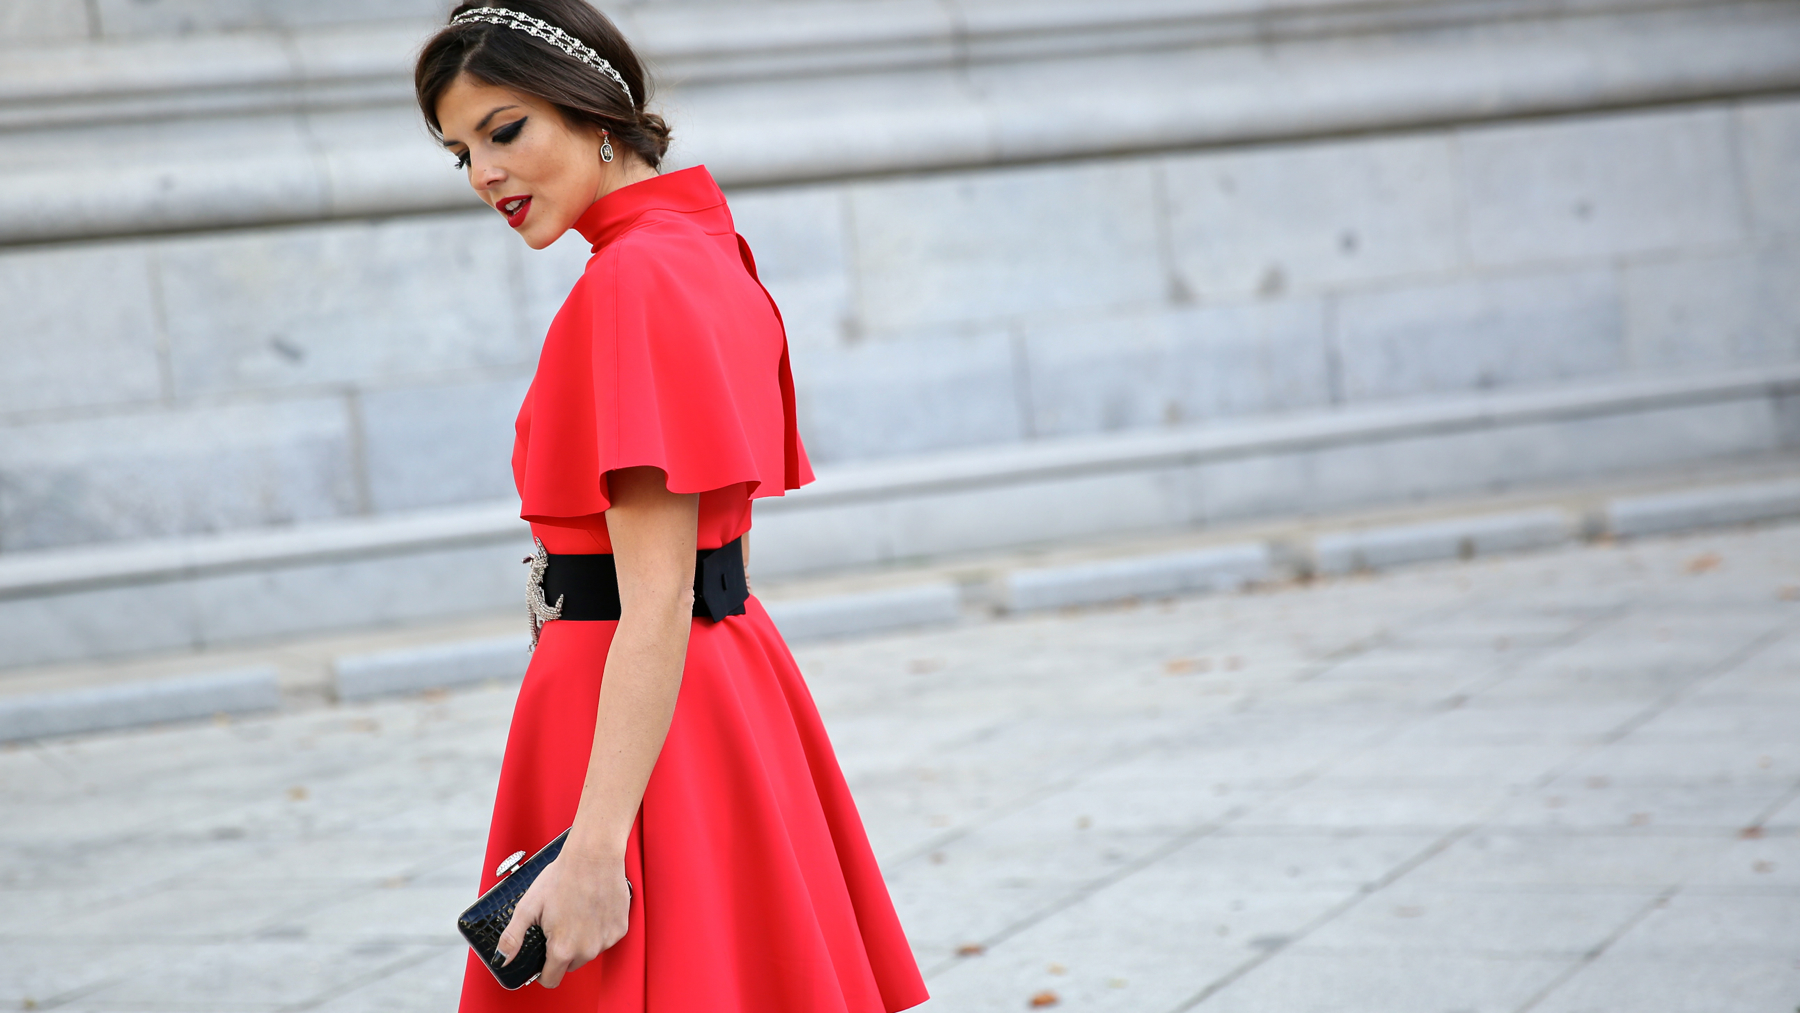 trendy_taste-look-outfit-street_style-ootd-blog-blogger-fashion_spain-moda_españa-vestido_fiesta-24fab-5